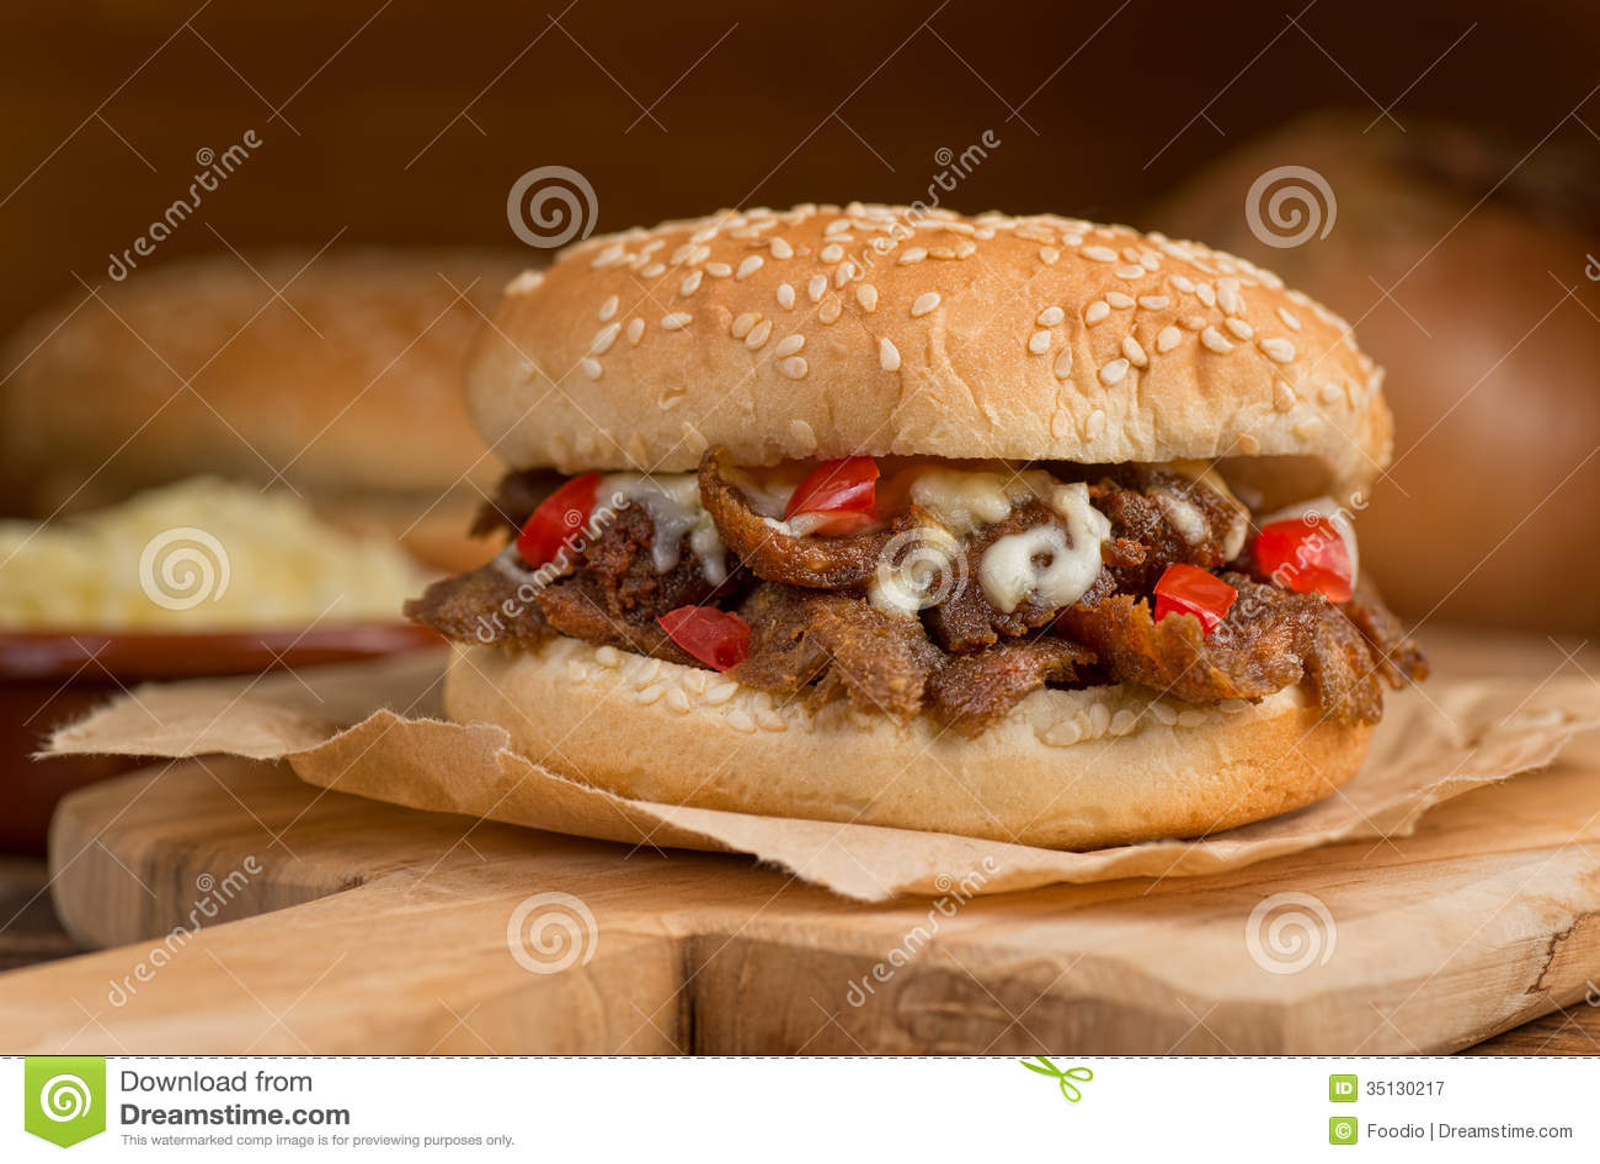 Donair hamburger